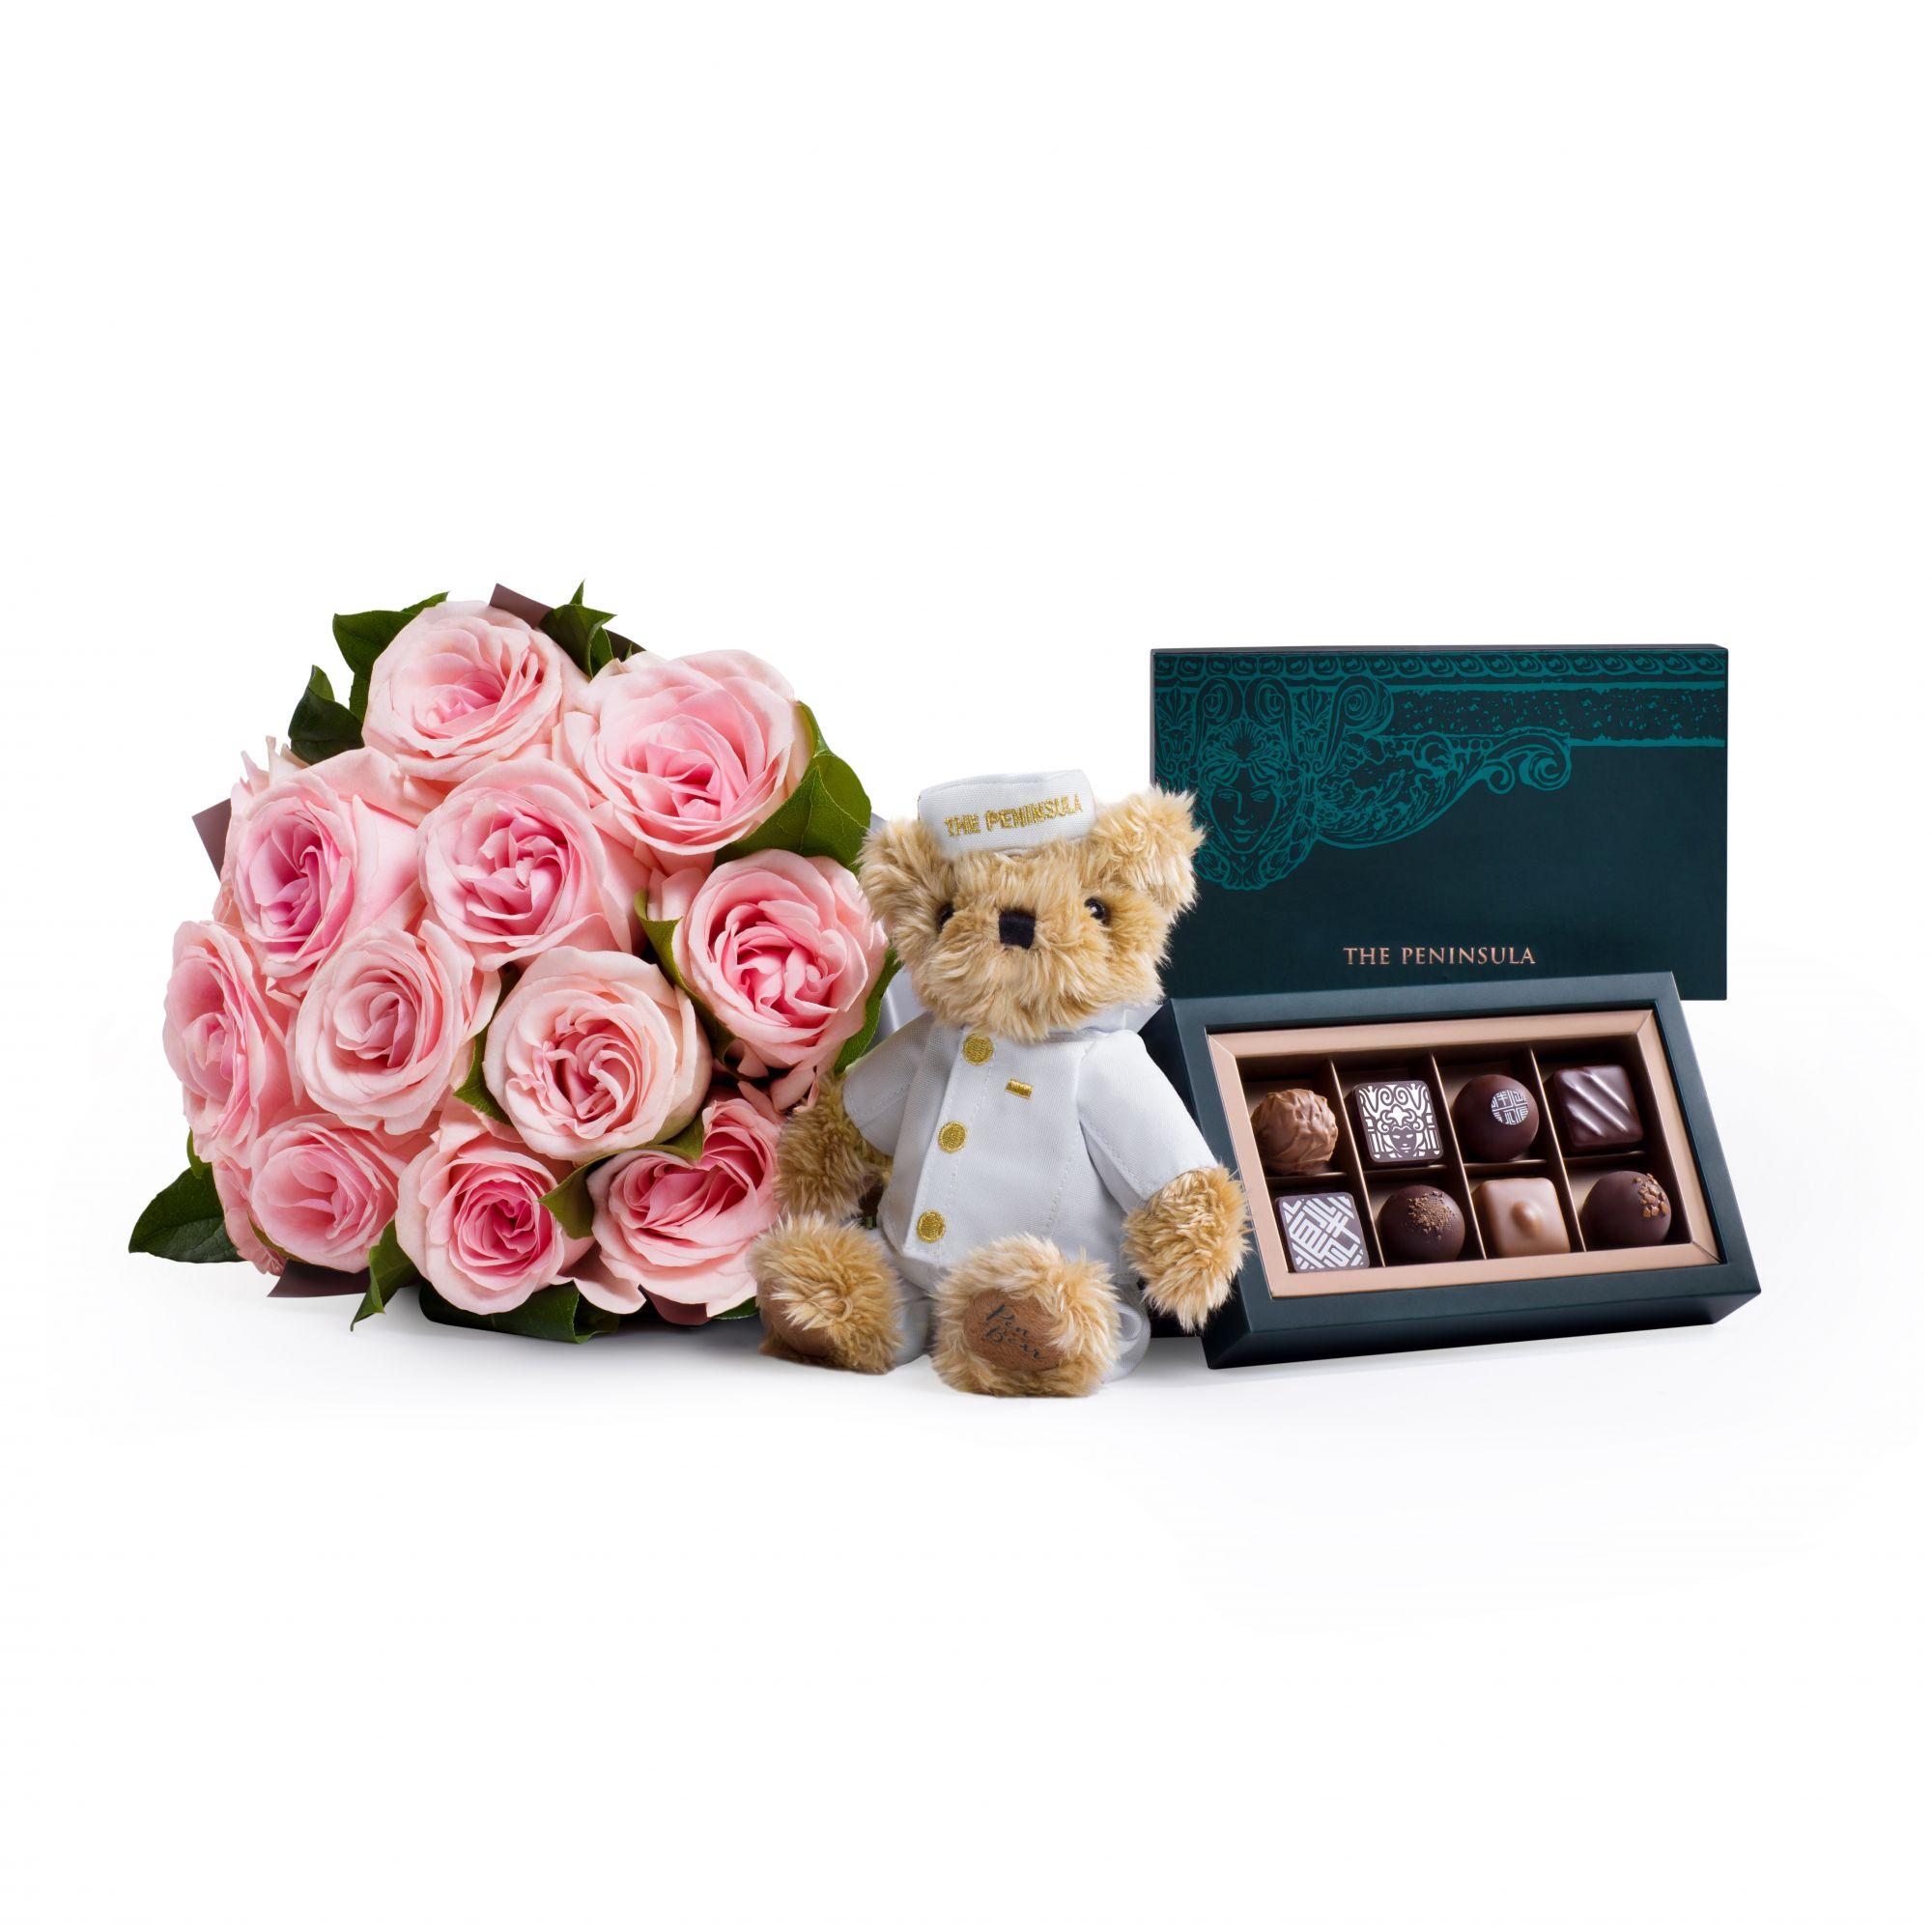 Hong Kong S Best Chocolate Gifts For Valentine S Day 2020 Tatler Hong Kong